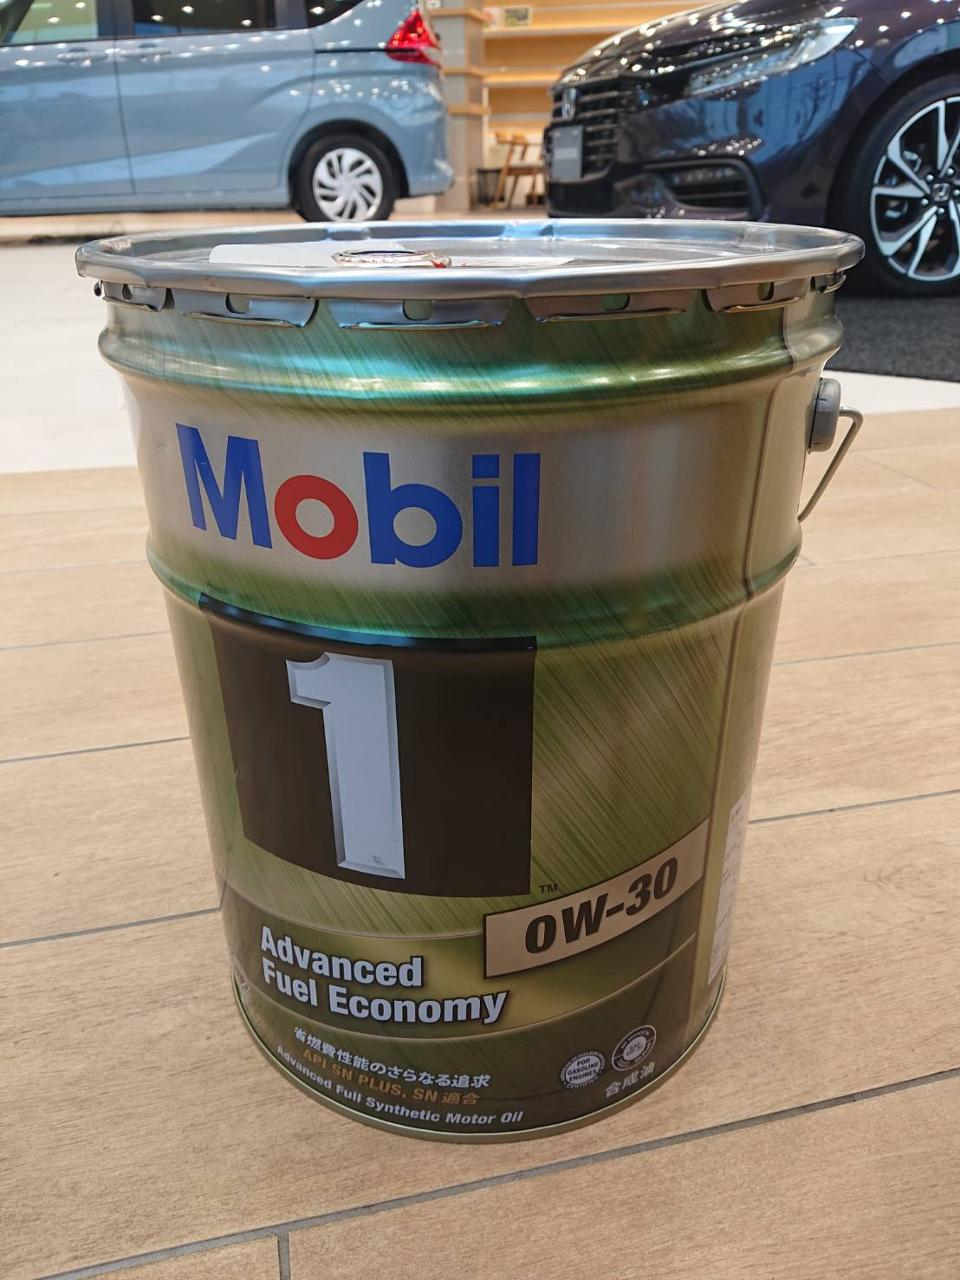 Mobil Mobil 1 Advanced Fuel Economy 0W-30